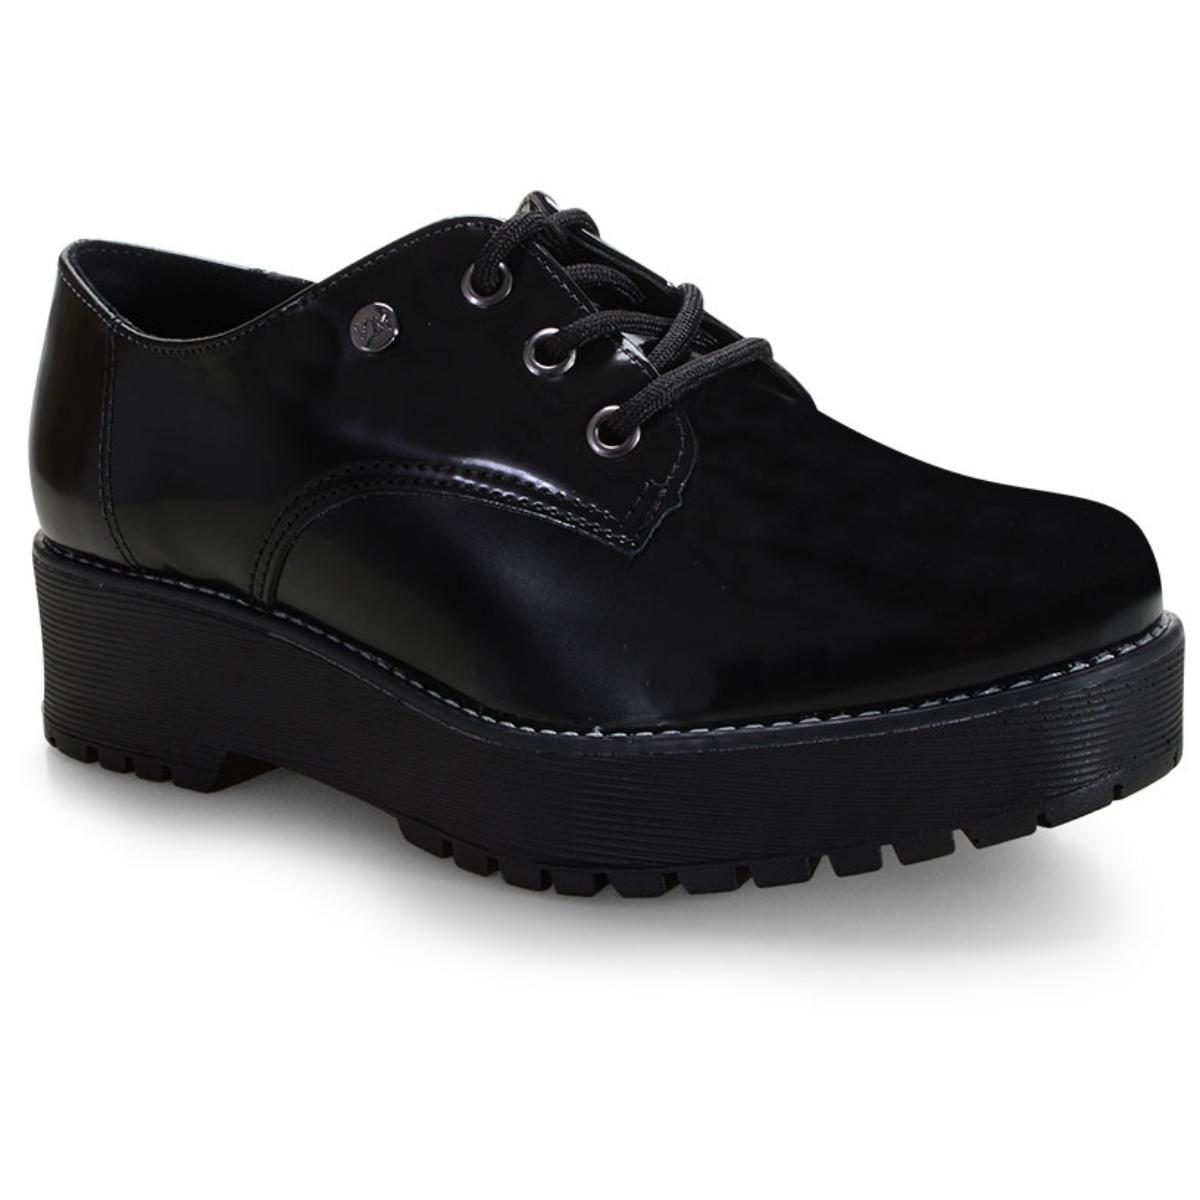 Sapato Feminino Via Marte 20-7305 Preto